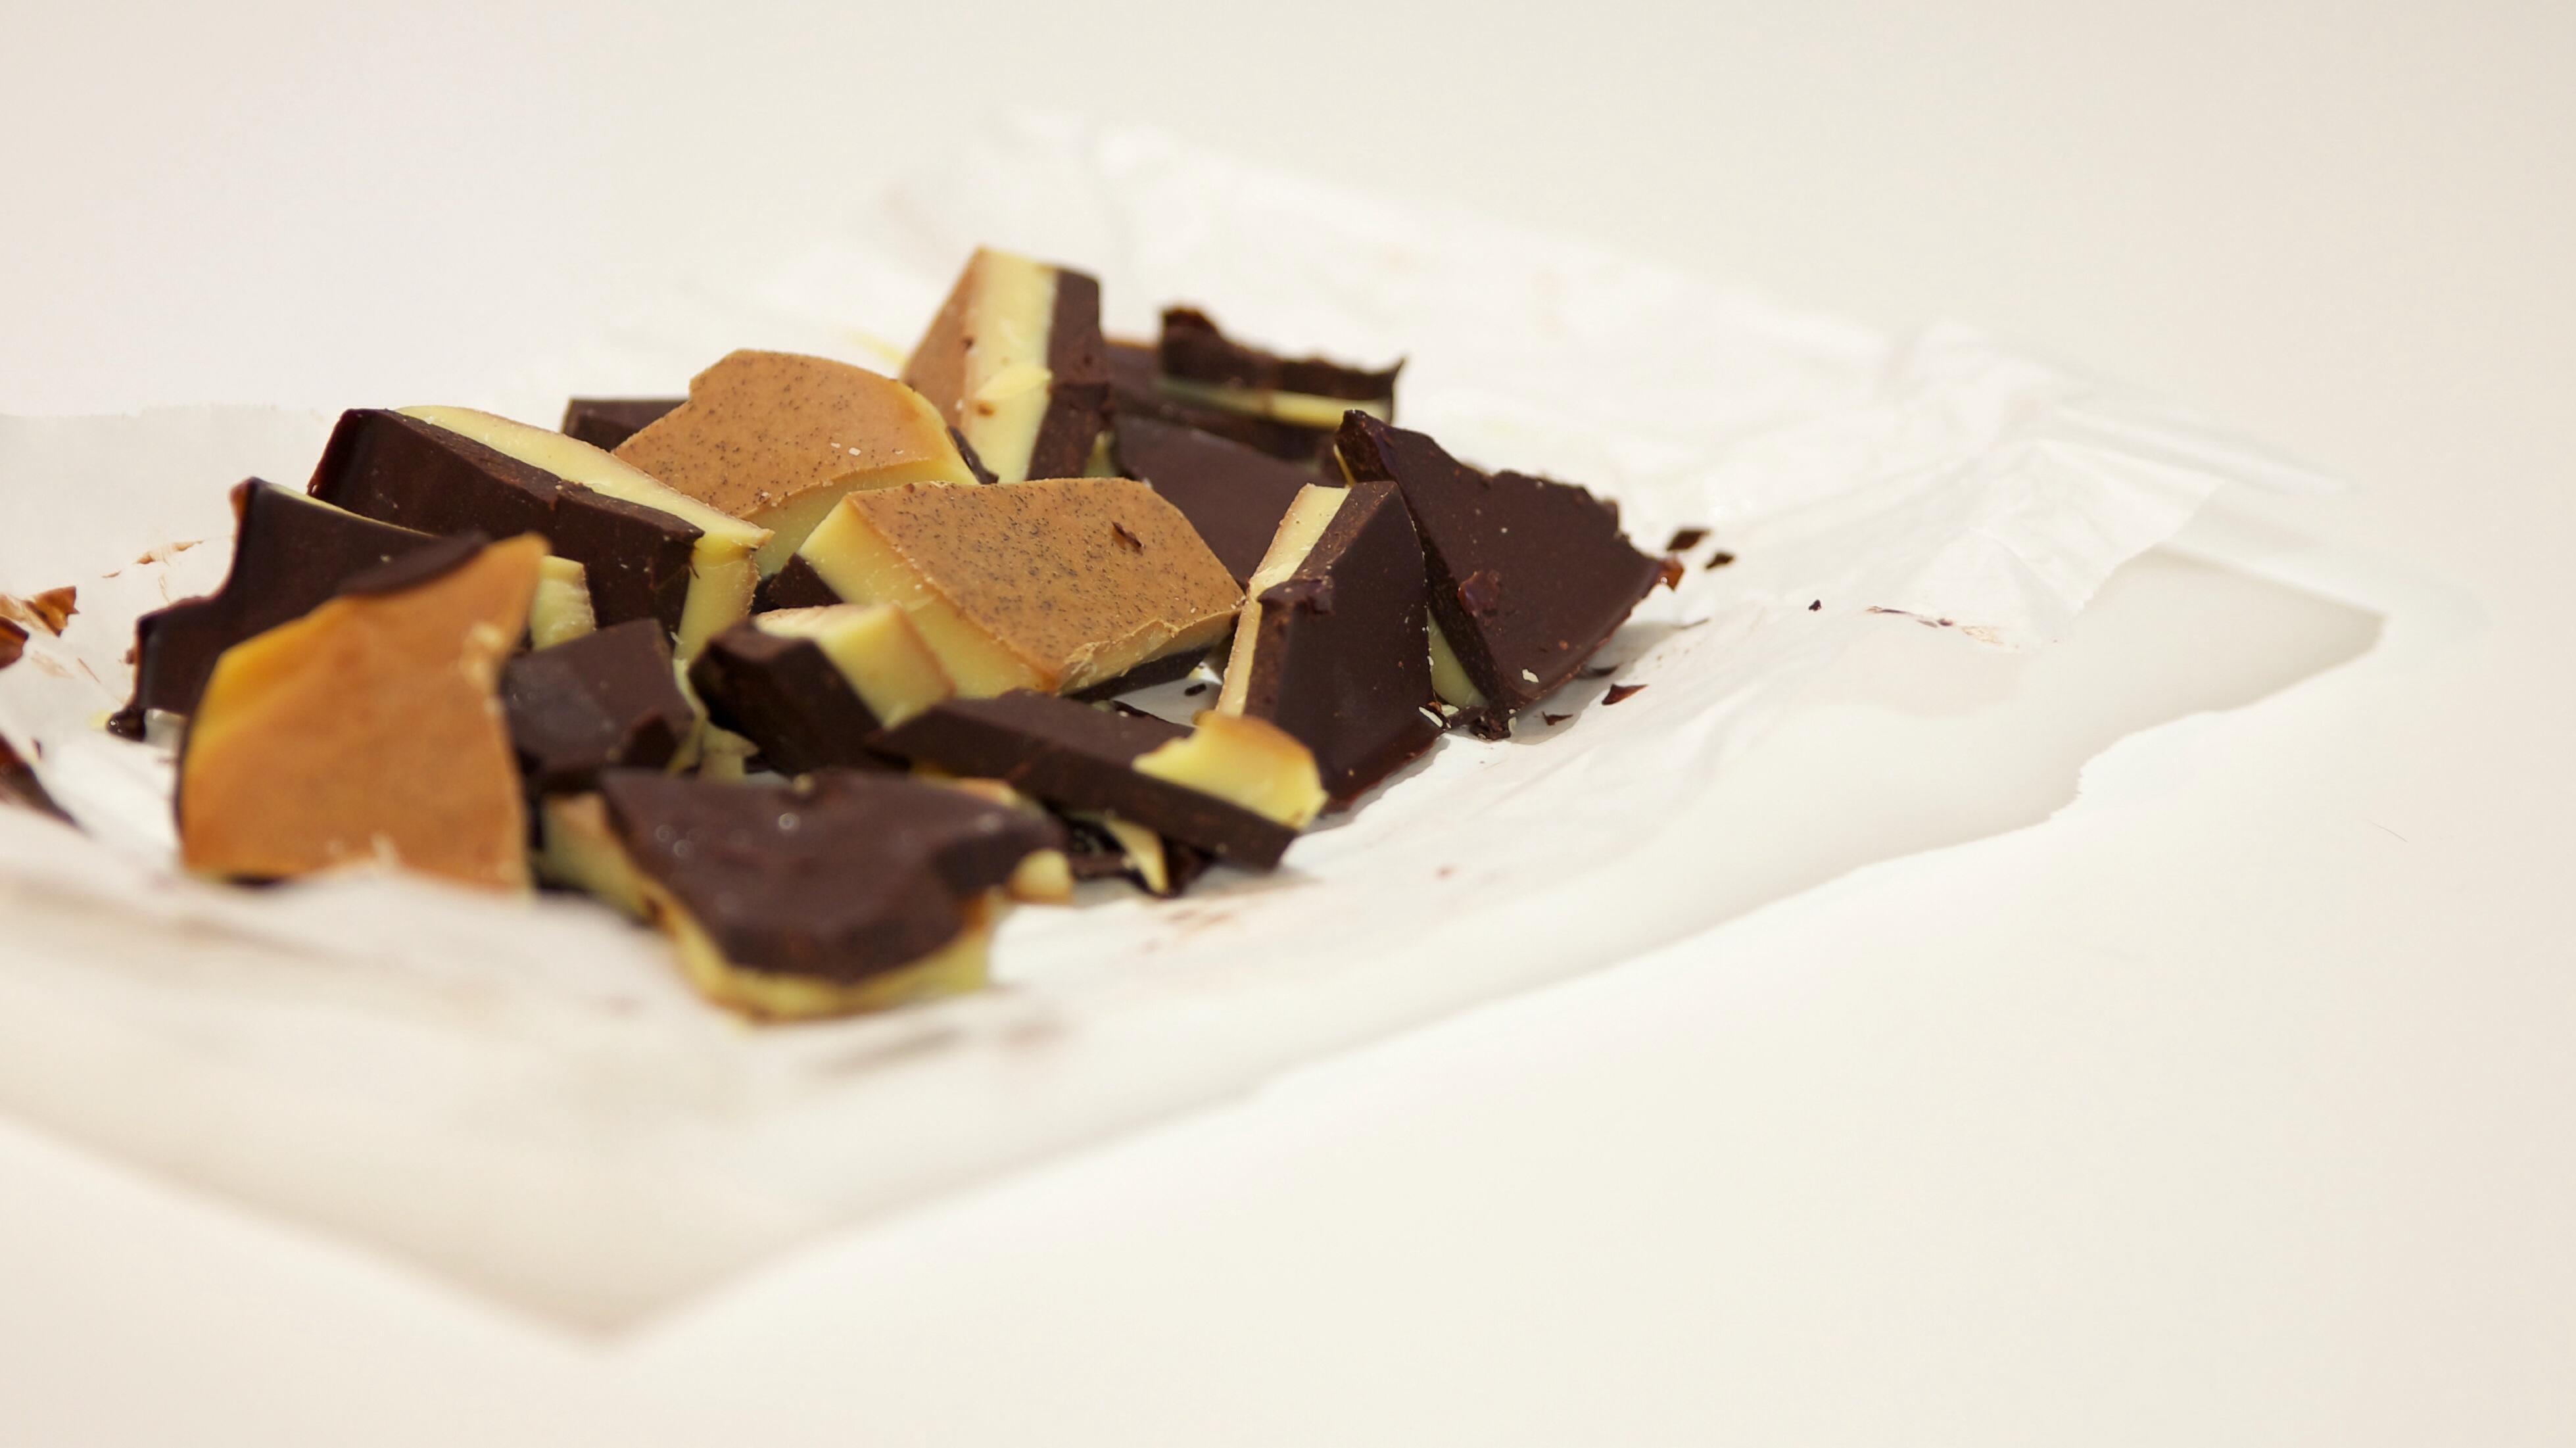 Top Deck Chocolate